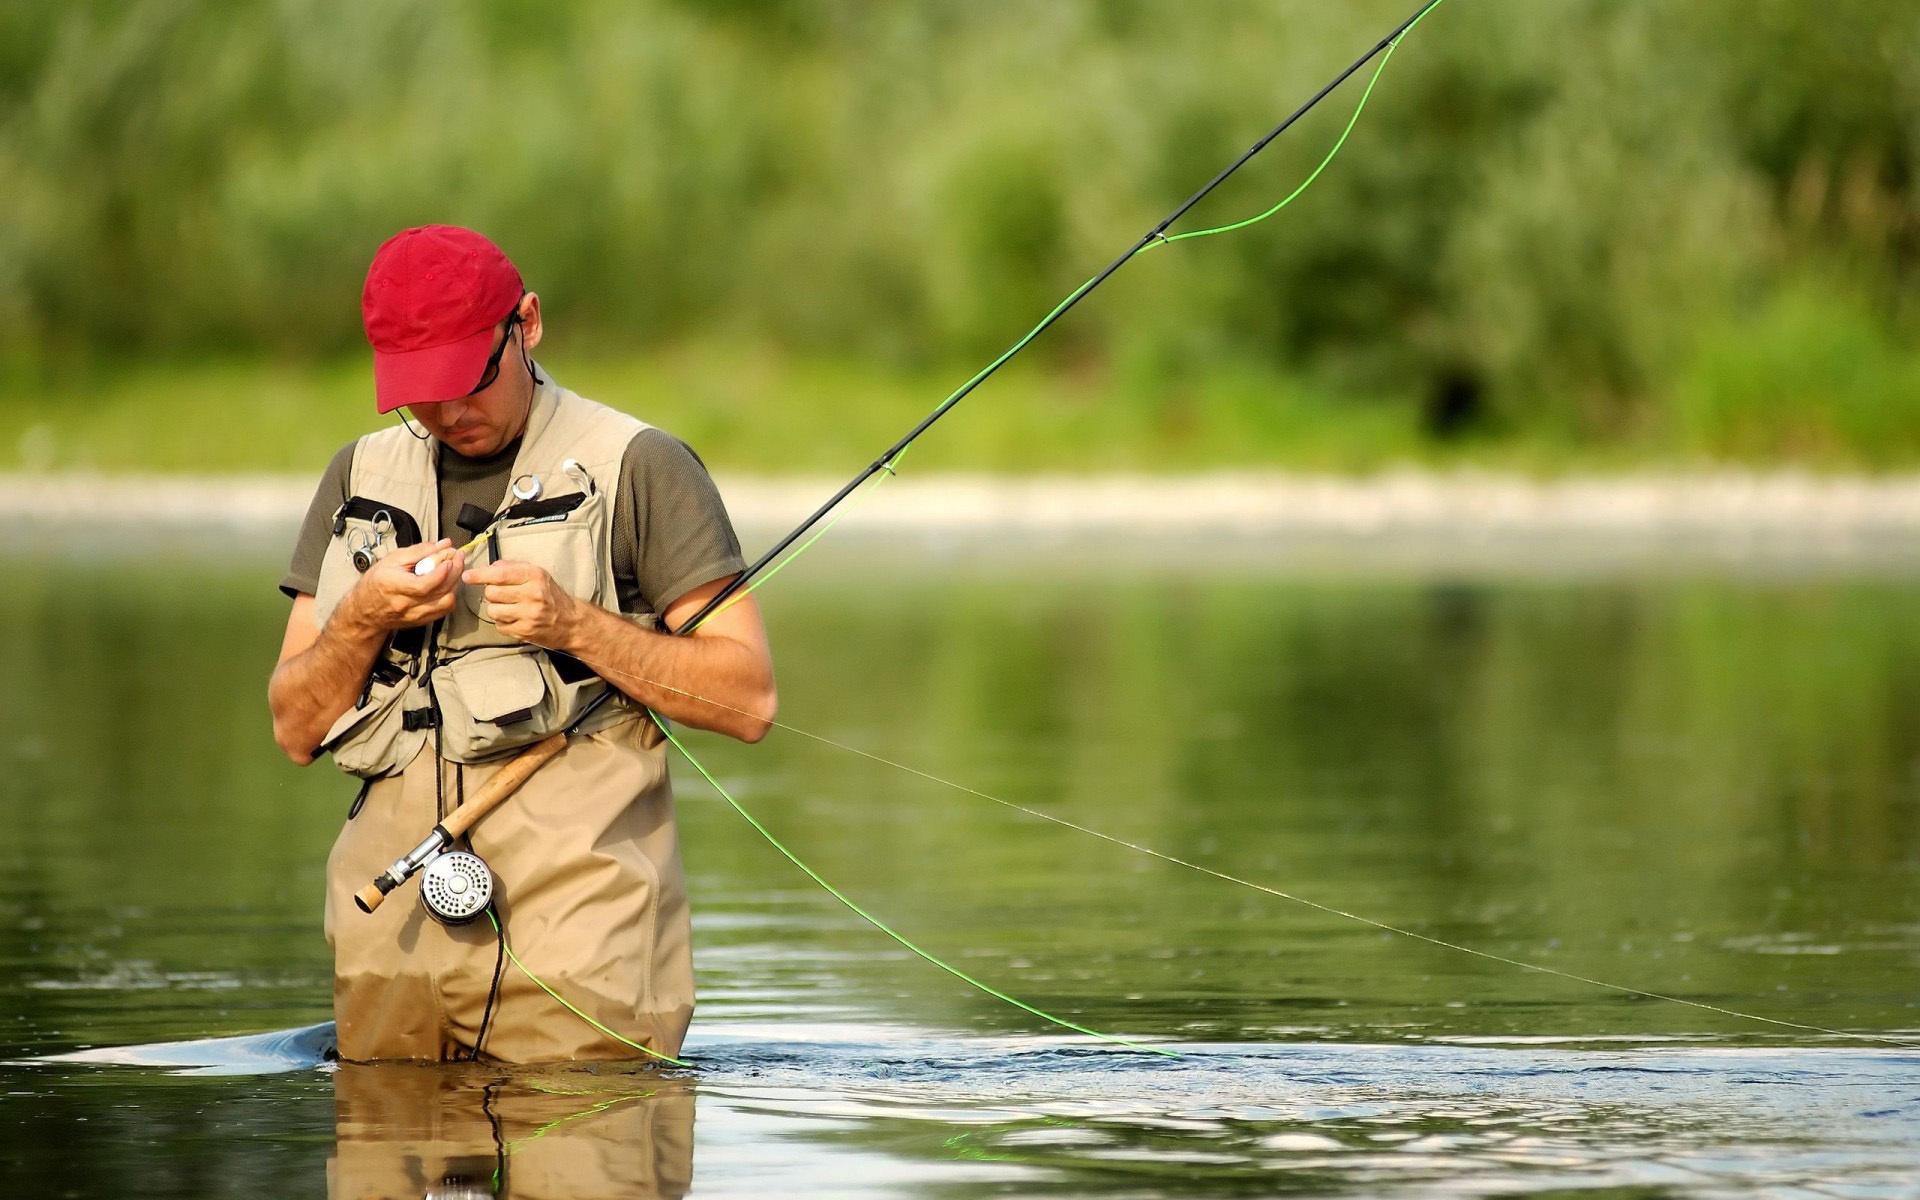 рыбак мужчина